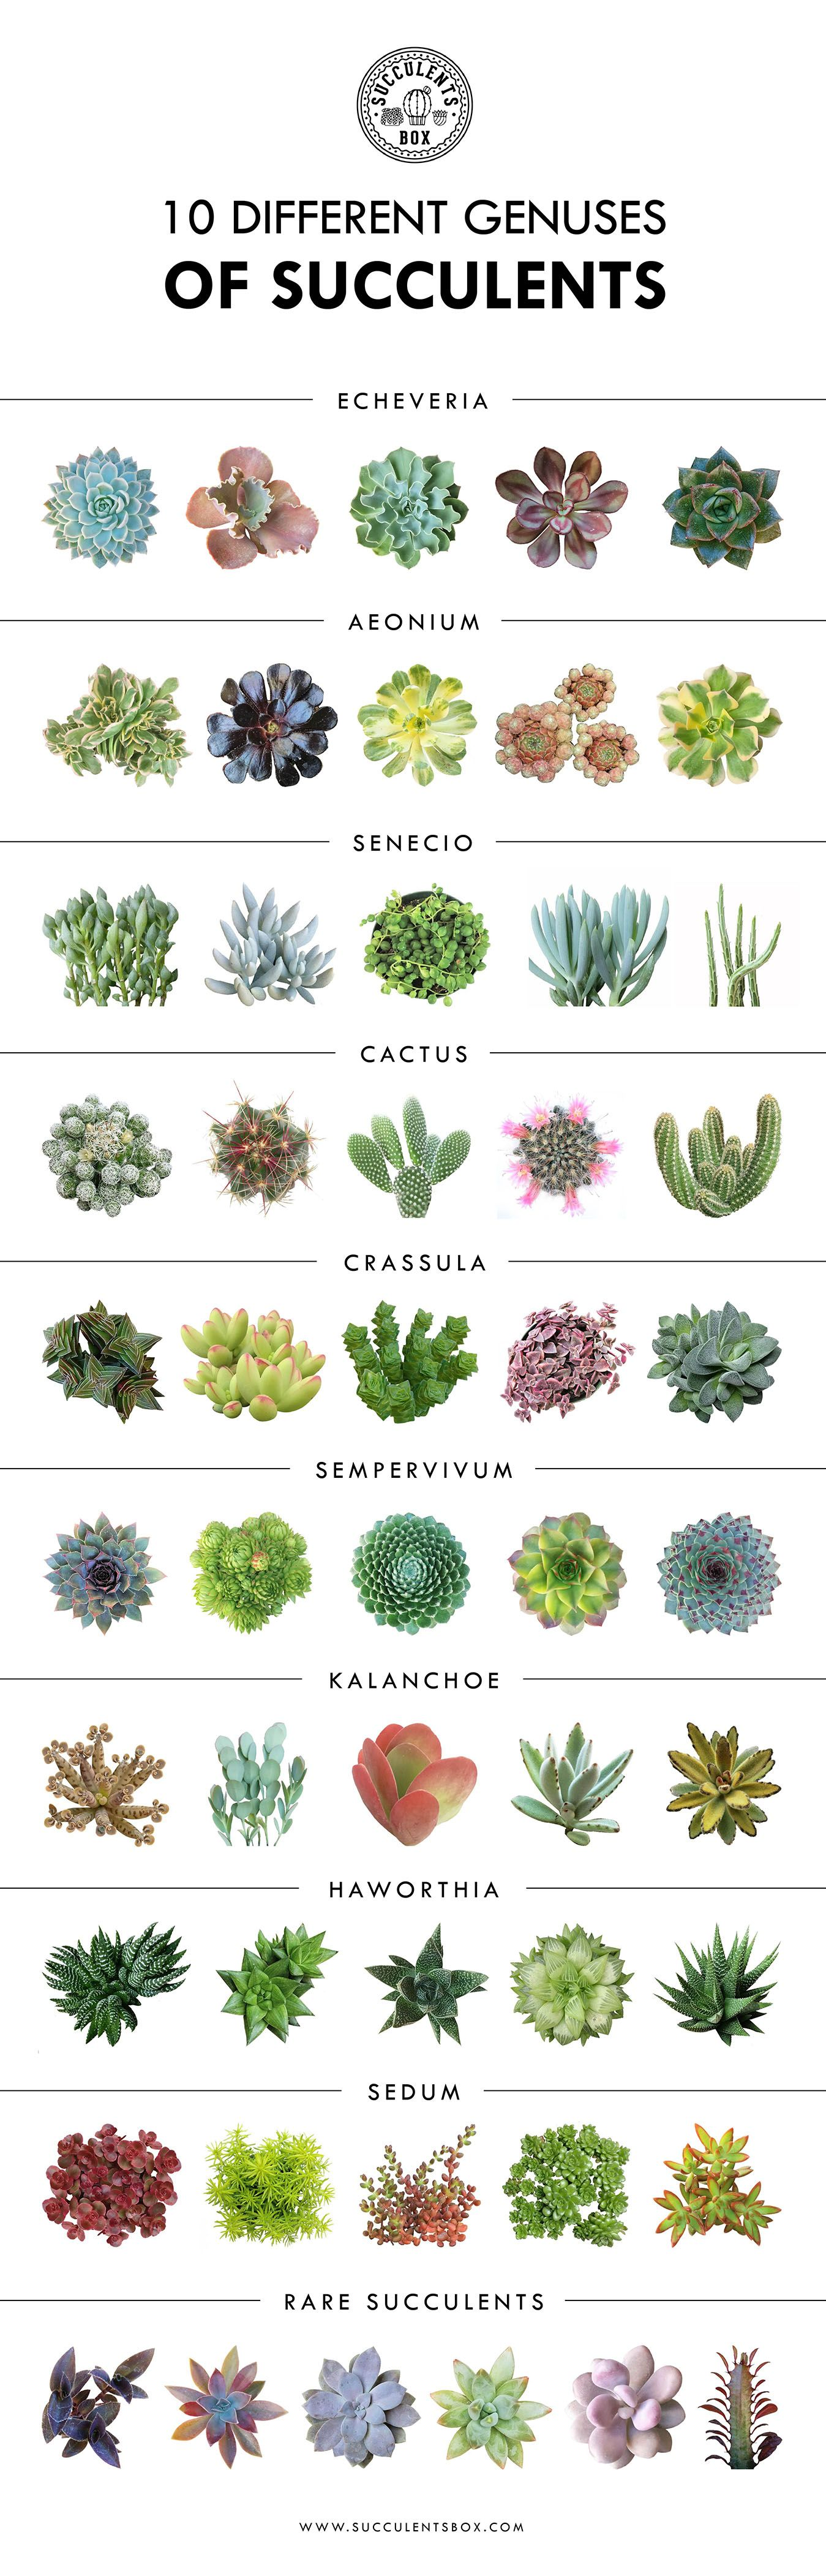 10 Different Genuses Of Succulents Succulents Echeveria Sedum Cactus Kalanchoe Aeonium Senecio Sepervivum Cotyle Plants Planting Succulents Succulents